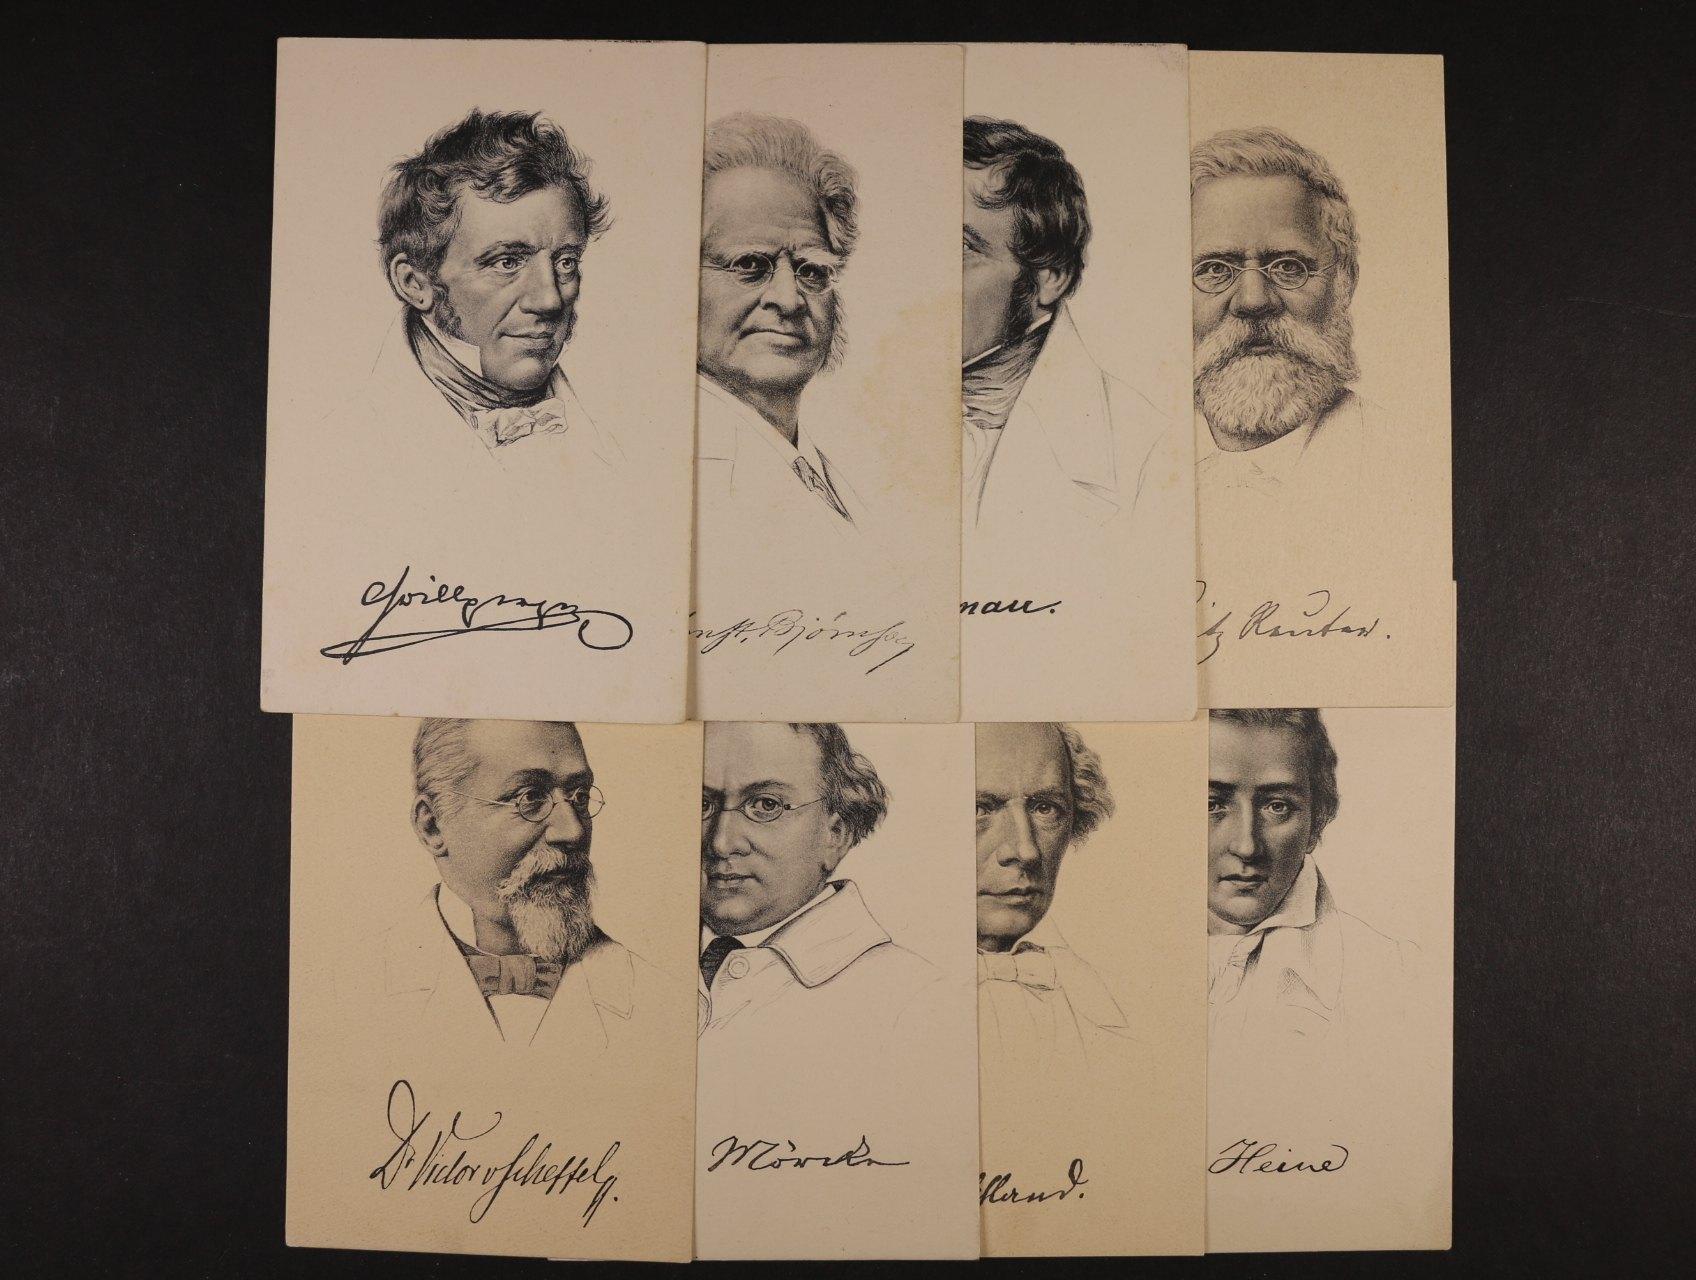 Osobnosti - sestava 9 ks nepoužitých jednobar. pohlednic s portréty H. Heine, F. Reuter, N. Lendau, R. Wagner, F. v List, 1x reliéfní A. Komenský